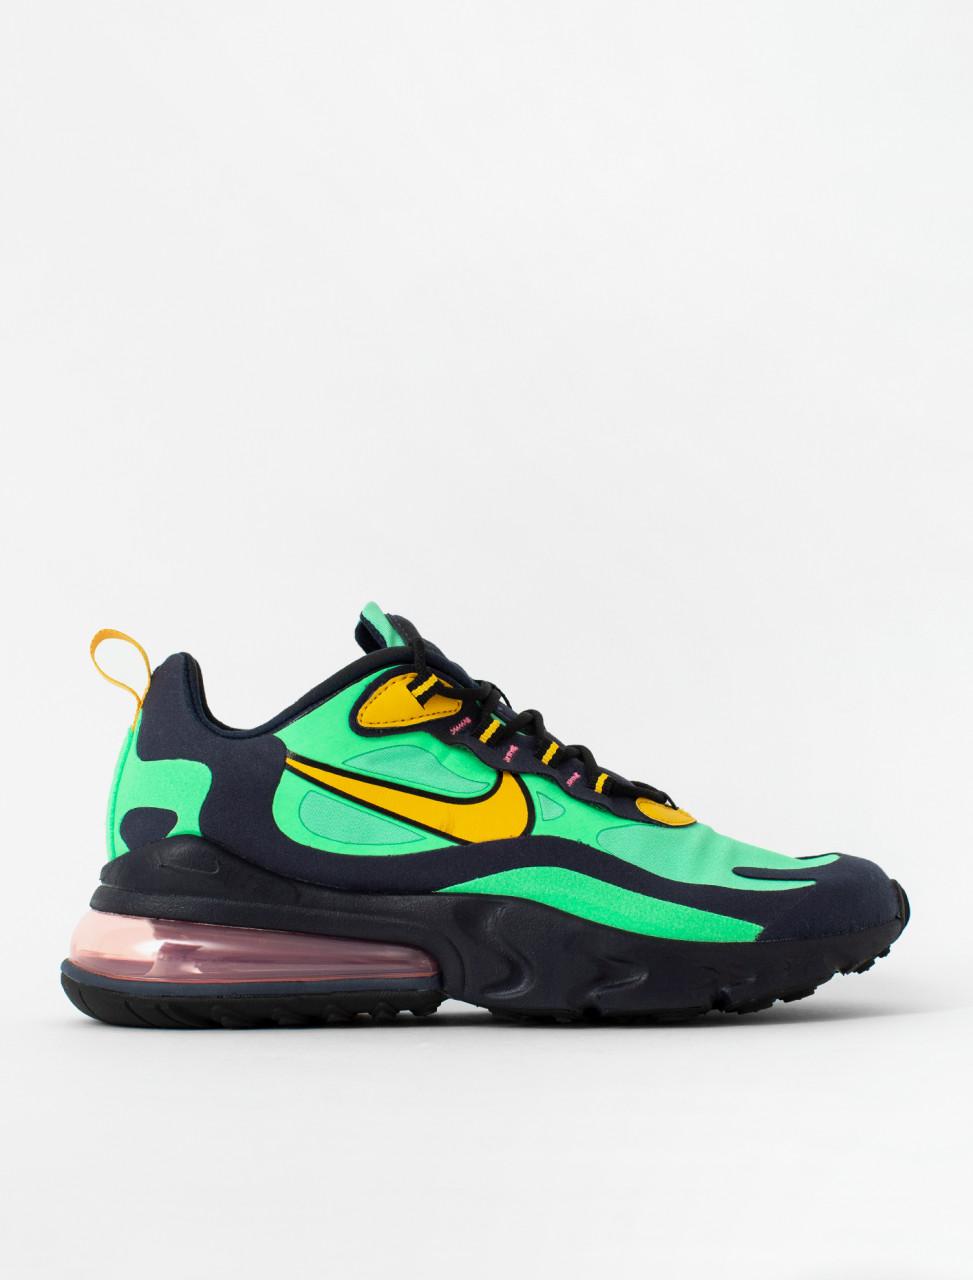 Air Max 270 React (Pop Art) Sneaker